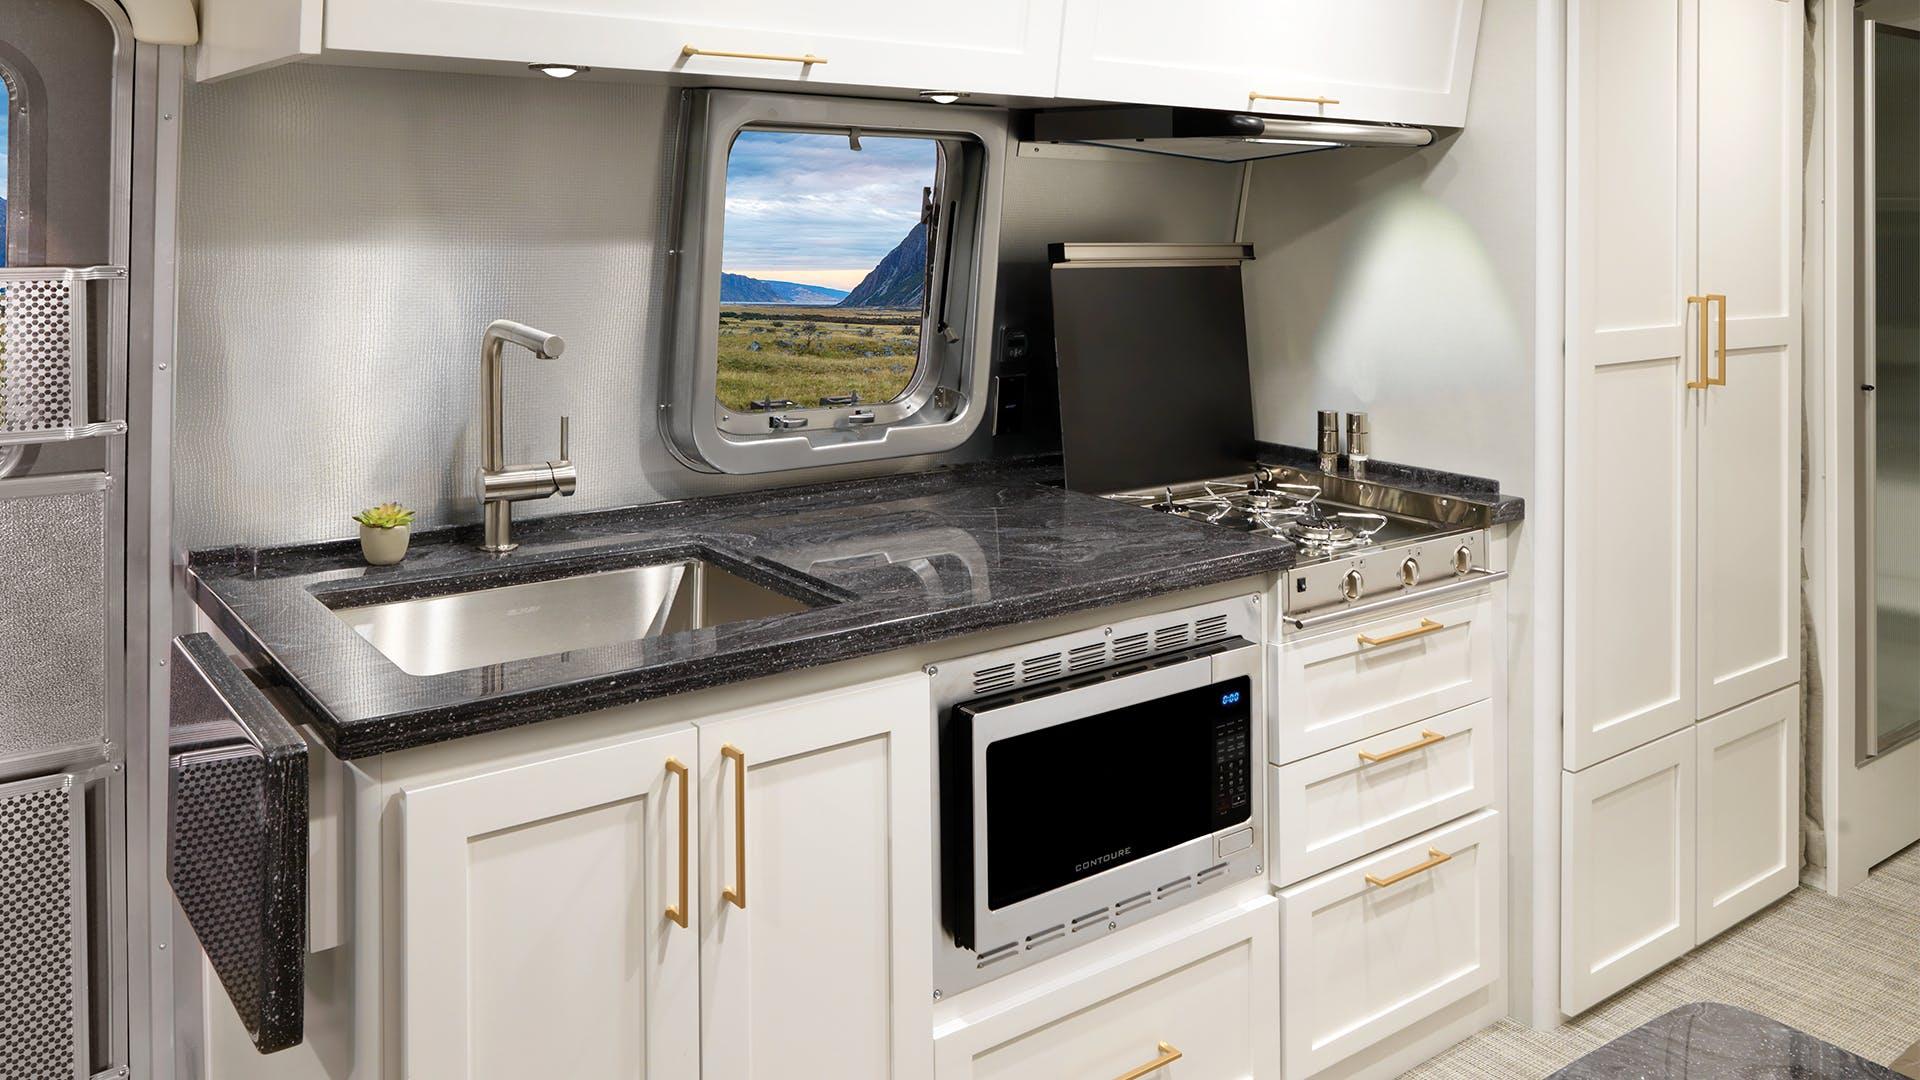 Airstream-Classic-30RB-Comfort-White-Kitchen-slider